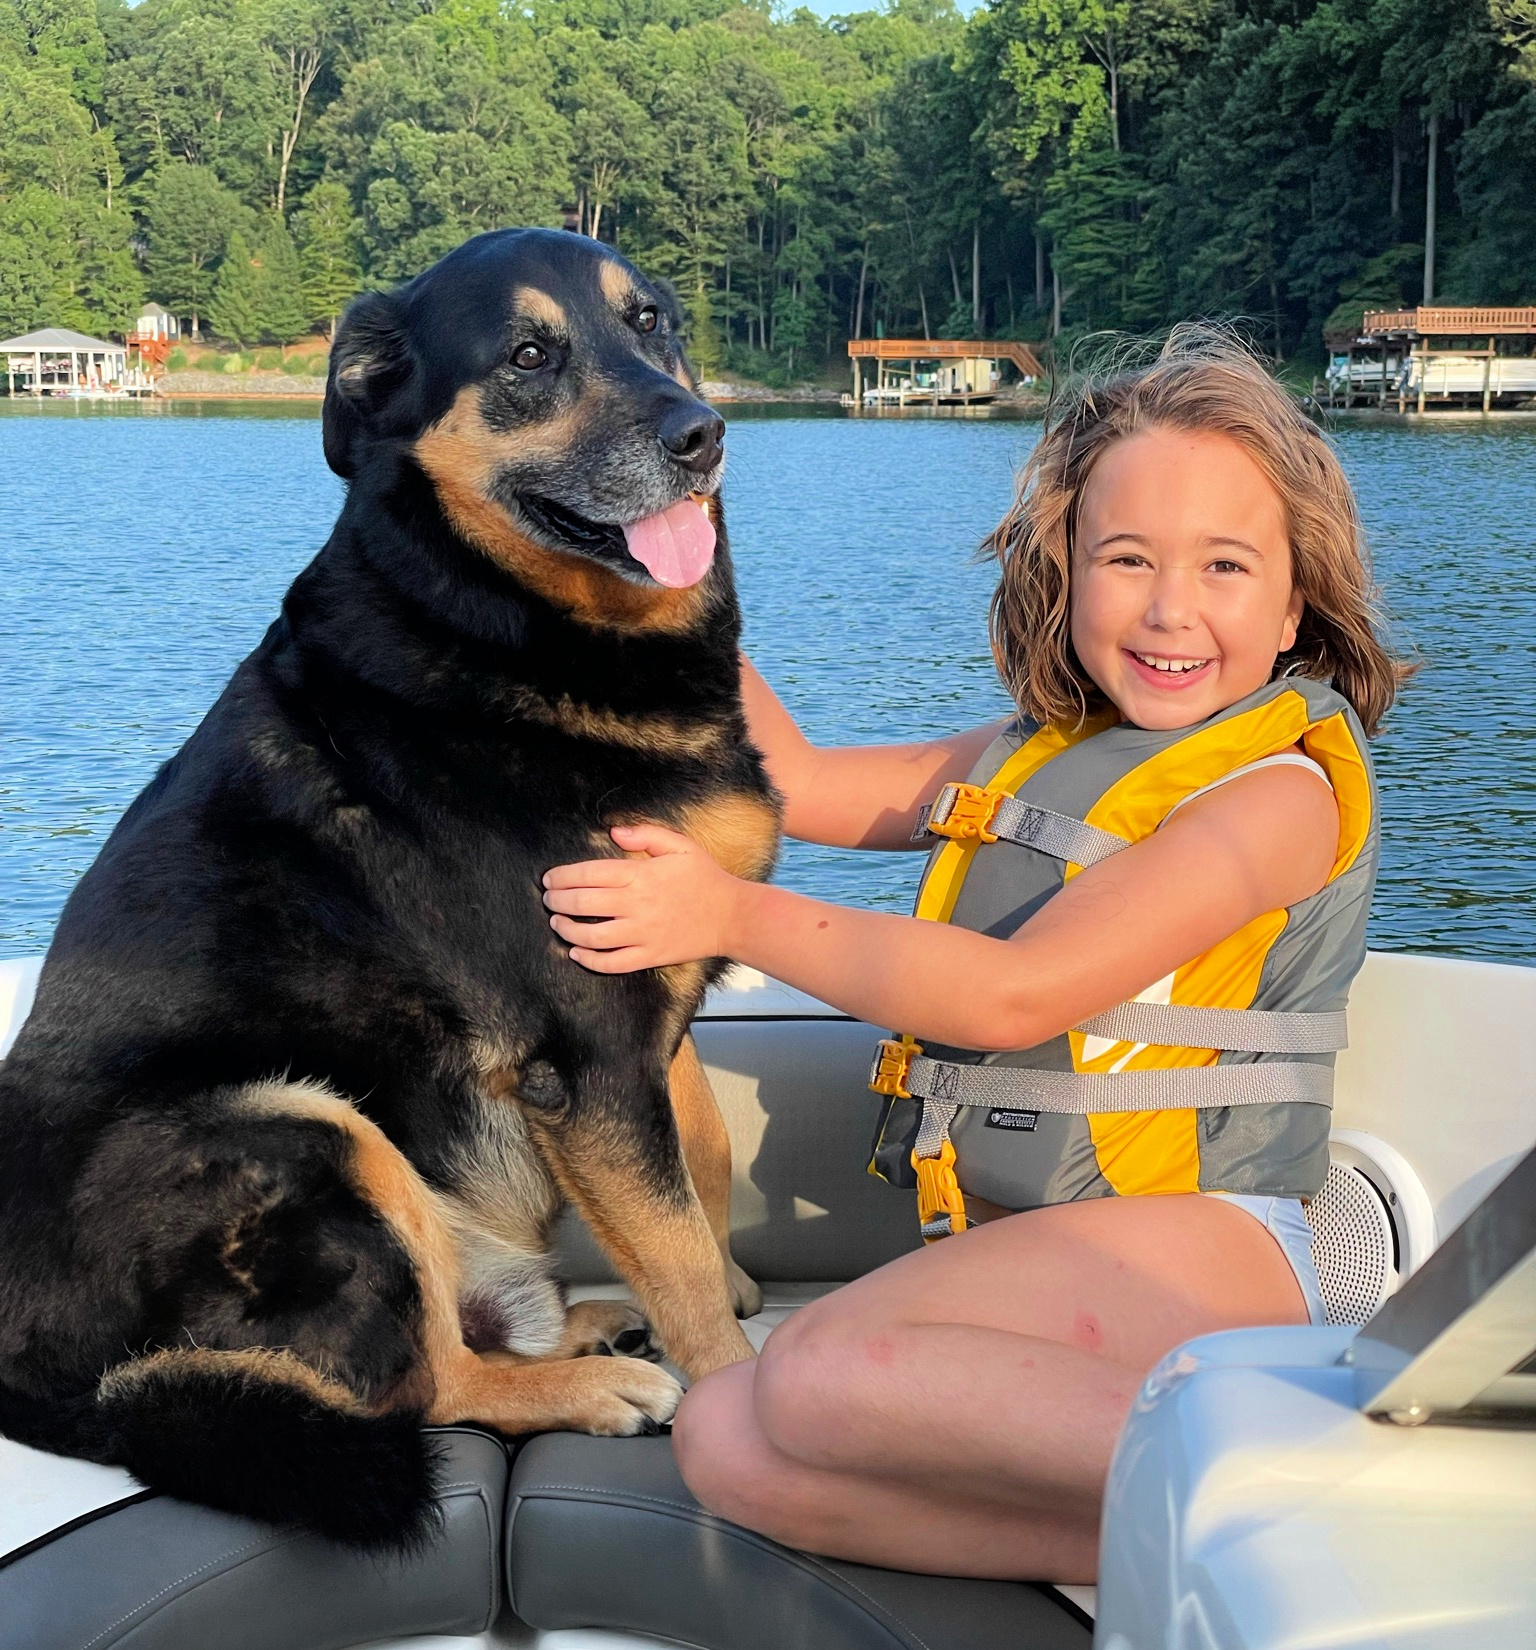 Child and dog on a boat at Smith Mountain Lake, VA